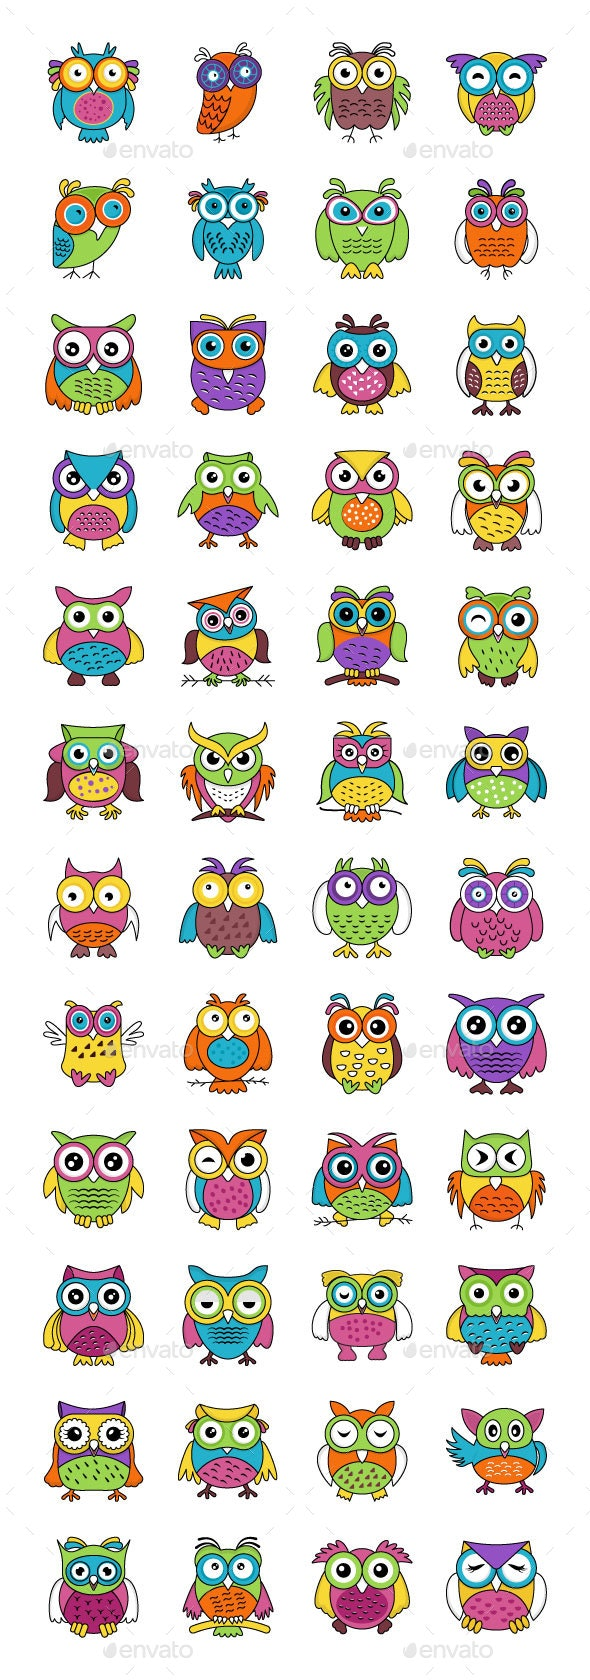 48 Baby Owl Cartoon Vector Icons - Icons